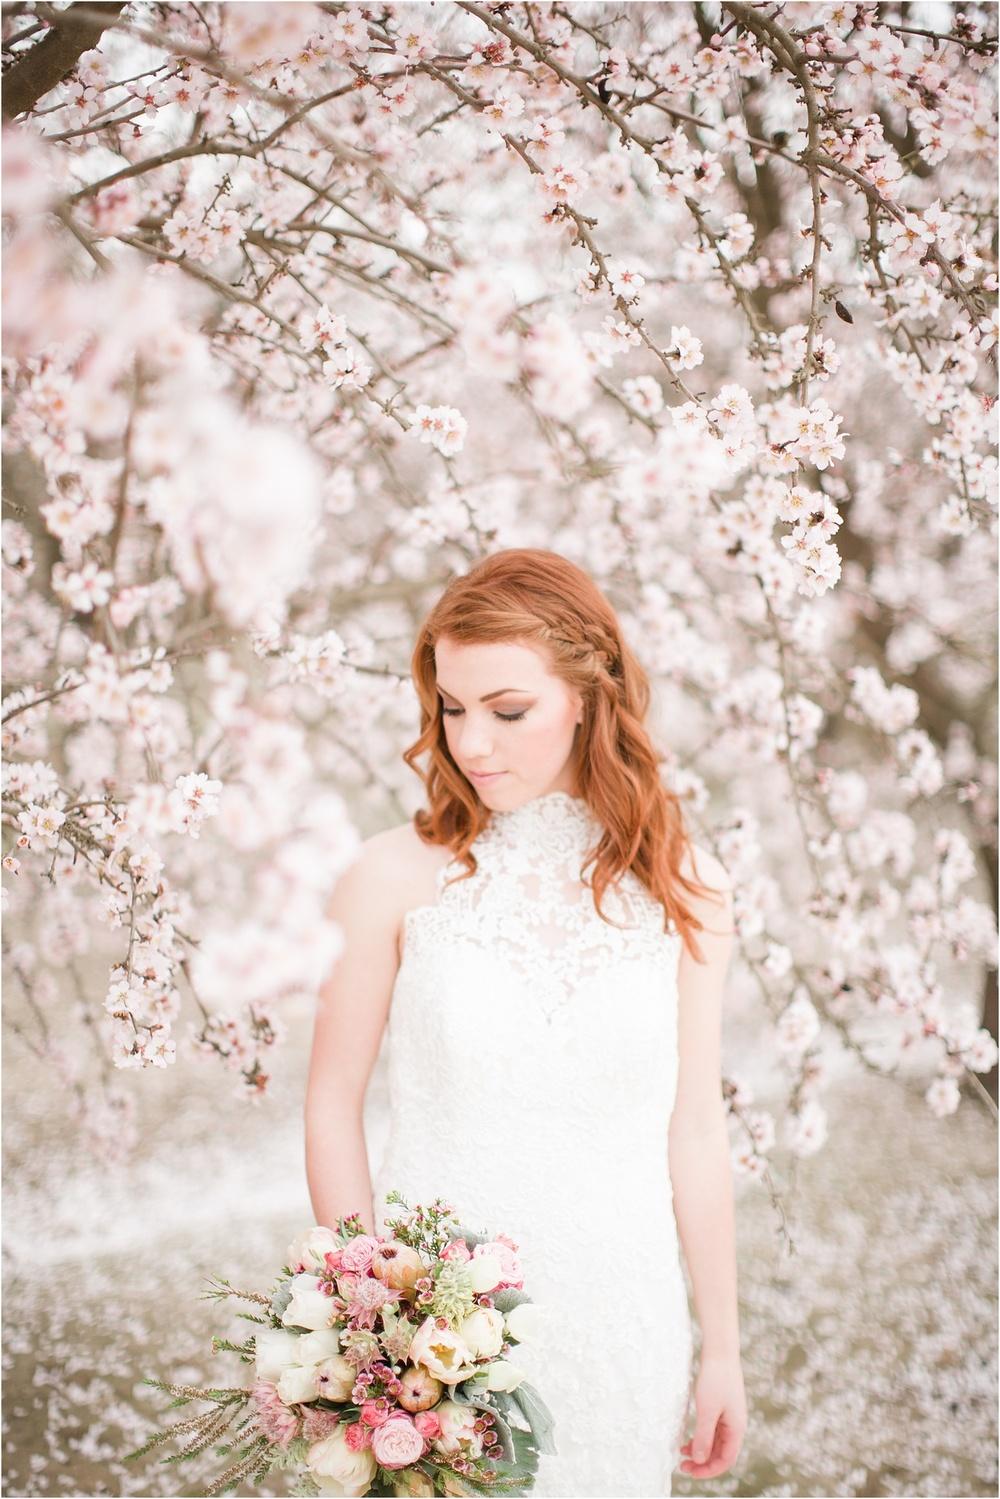 fine-art-wedding-garden-inspiration-20.jpg